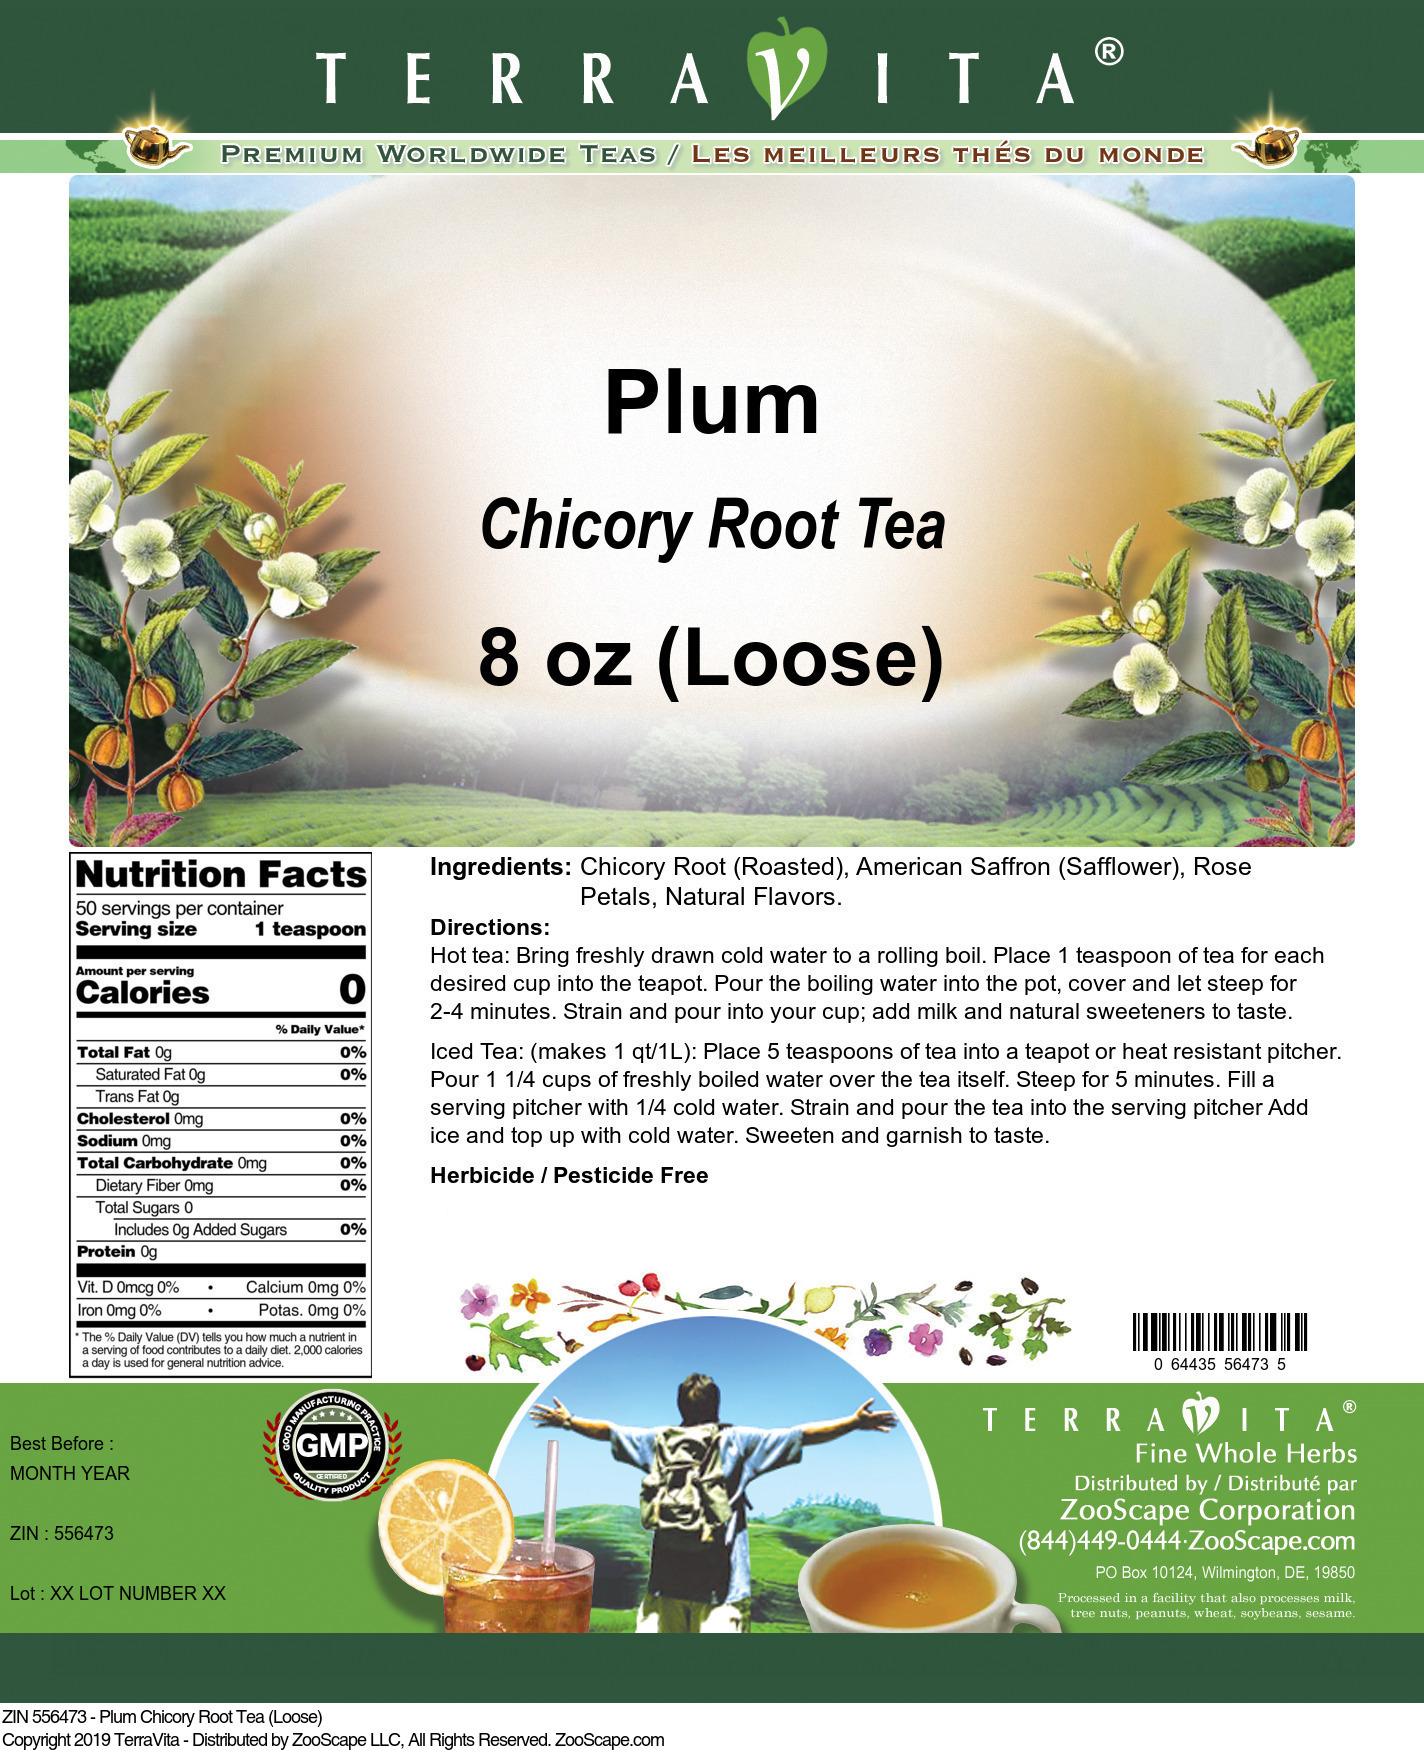 Plum Chicory Root Tea (Loose)